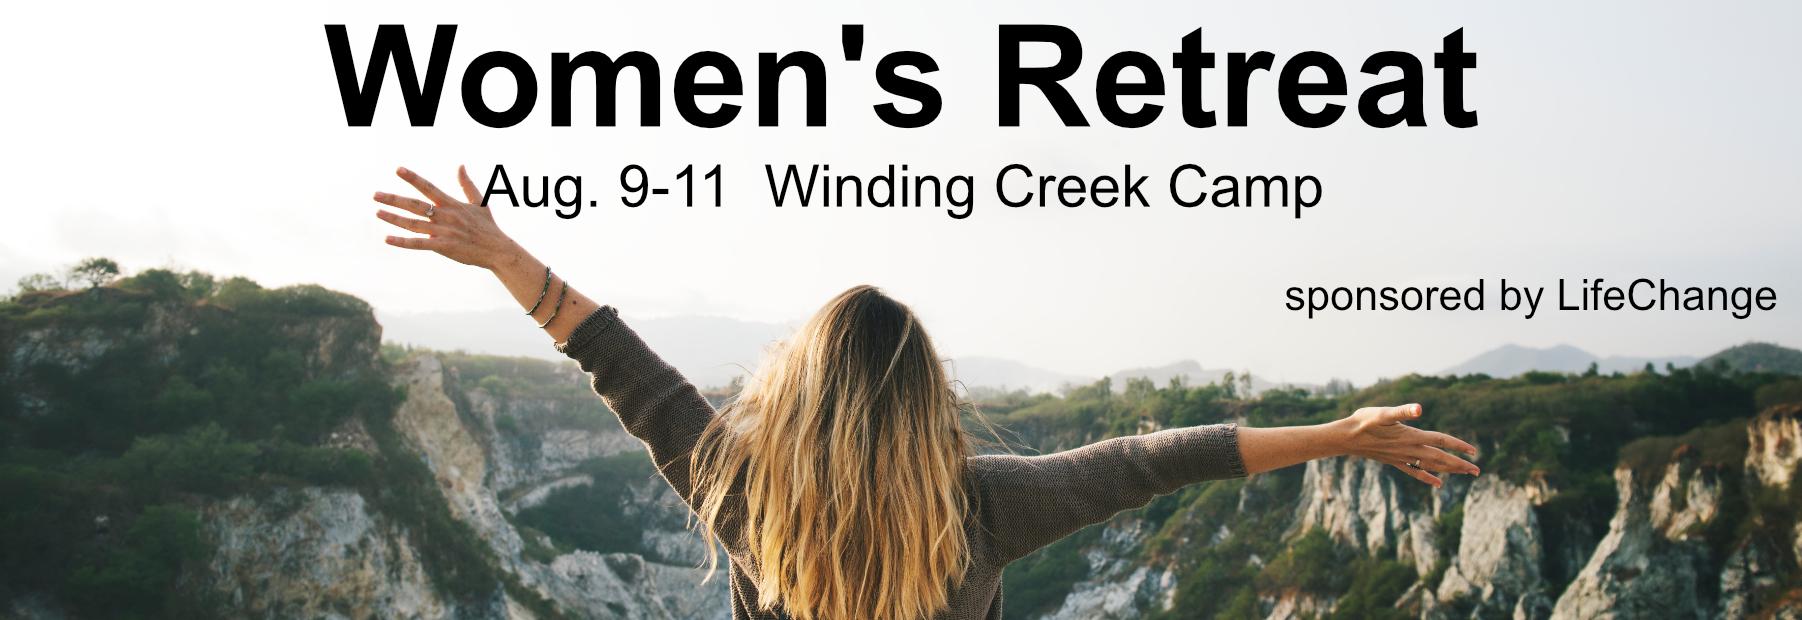 Womens Retreat 2019 webbanner.jpg